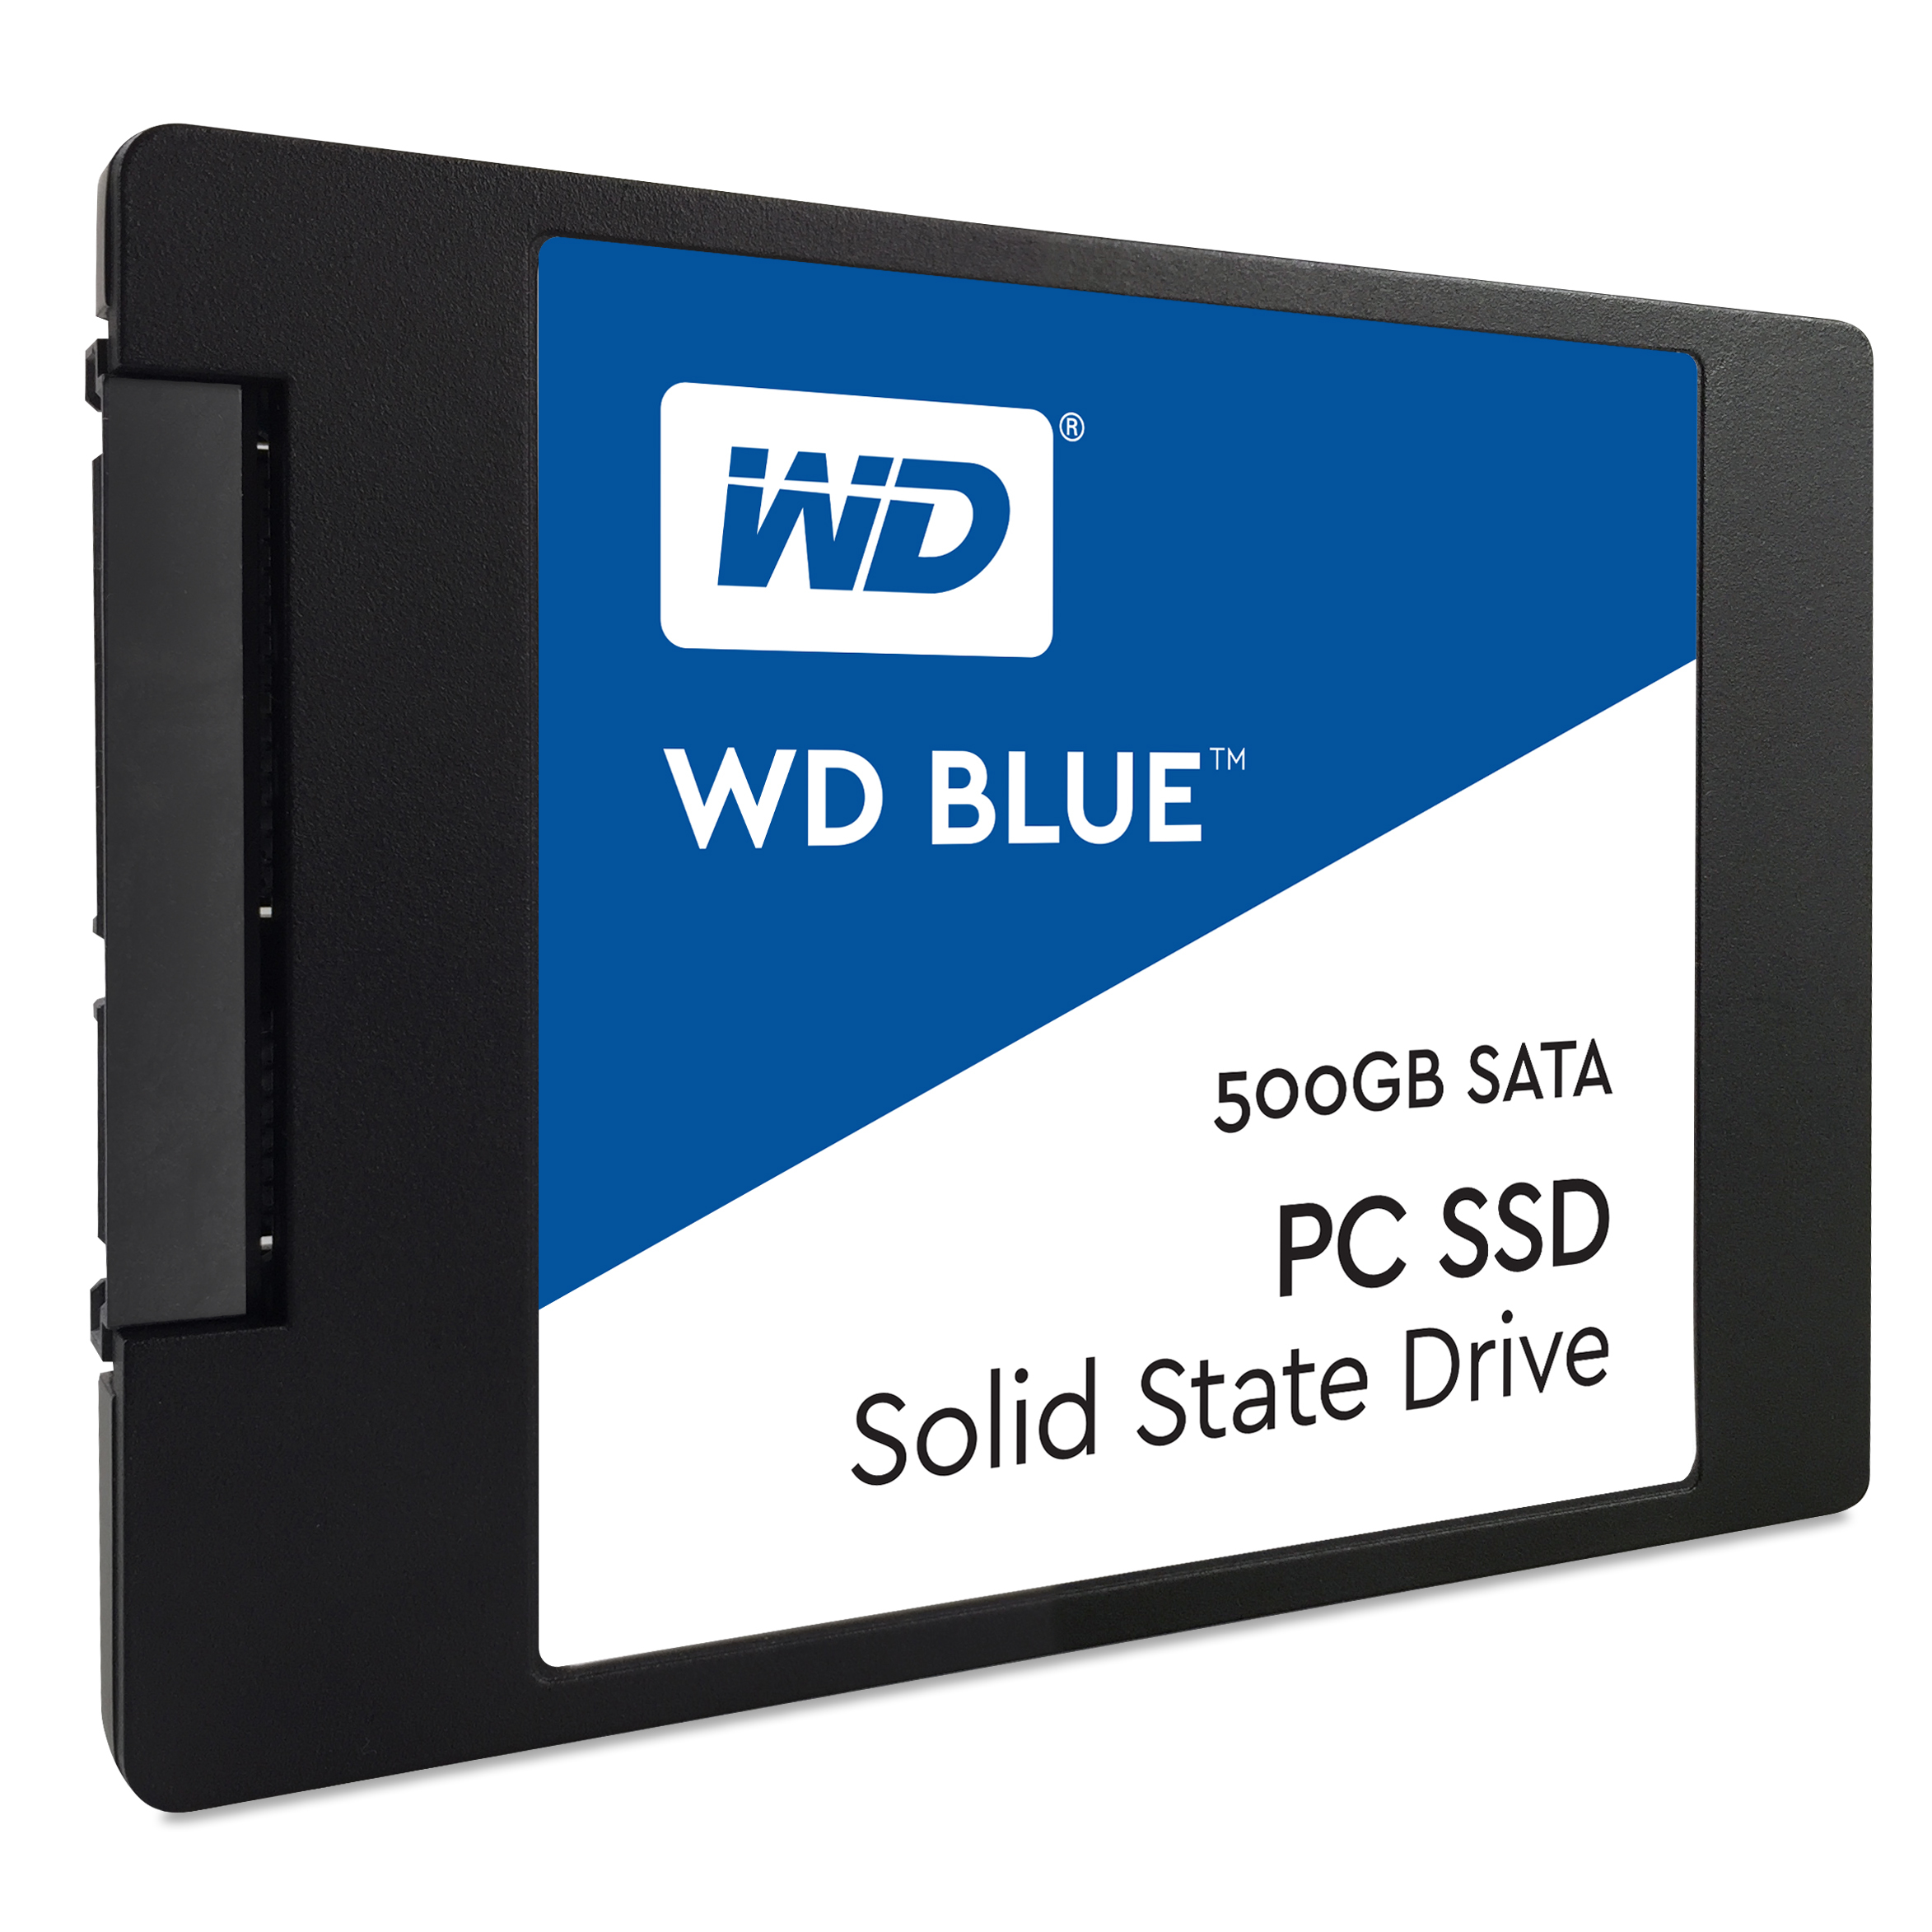 WD Blue PC SSD - Solid state drive - 500 GB - internal - 2.5 inch - SATA 6Gb/s